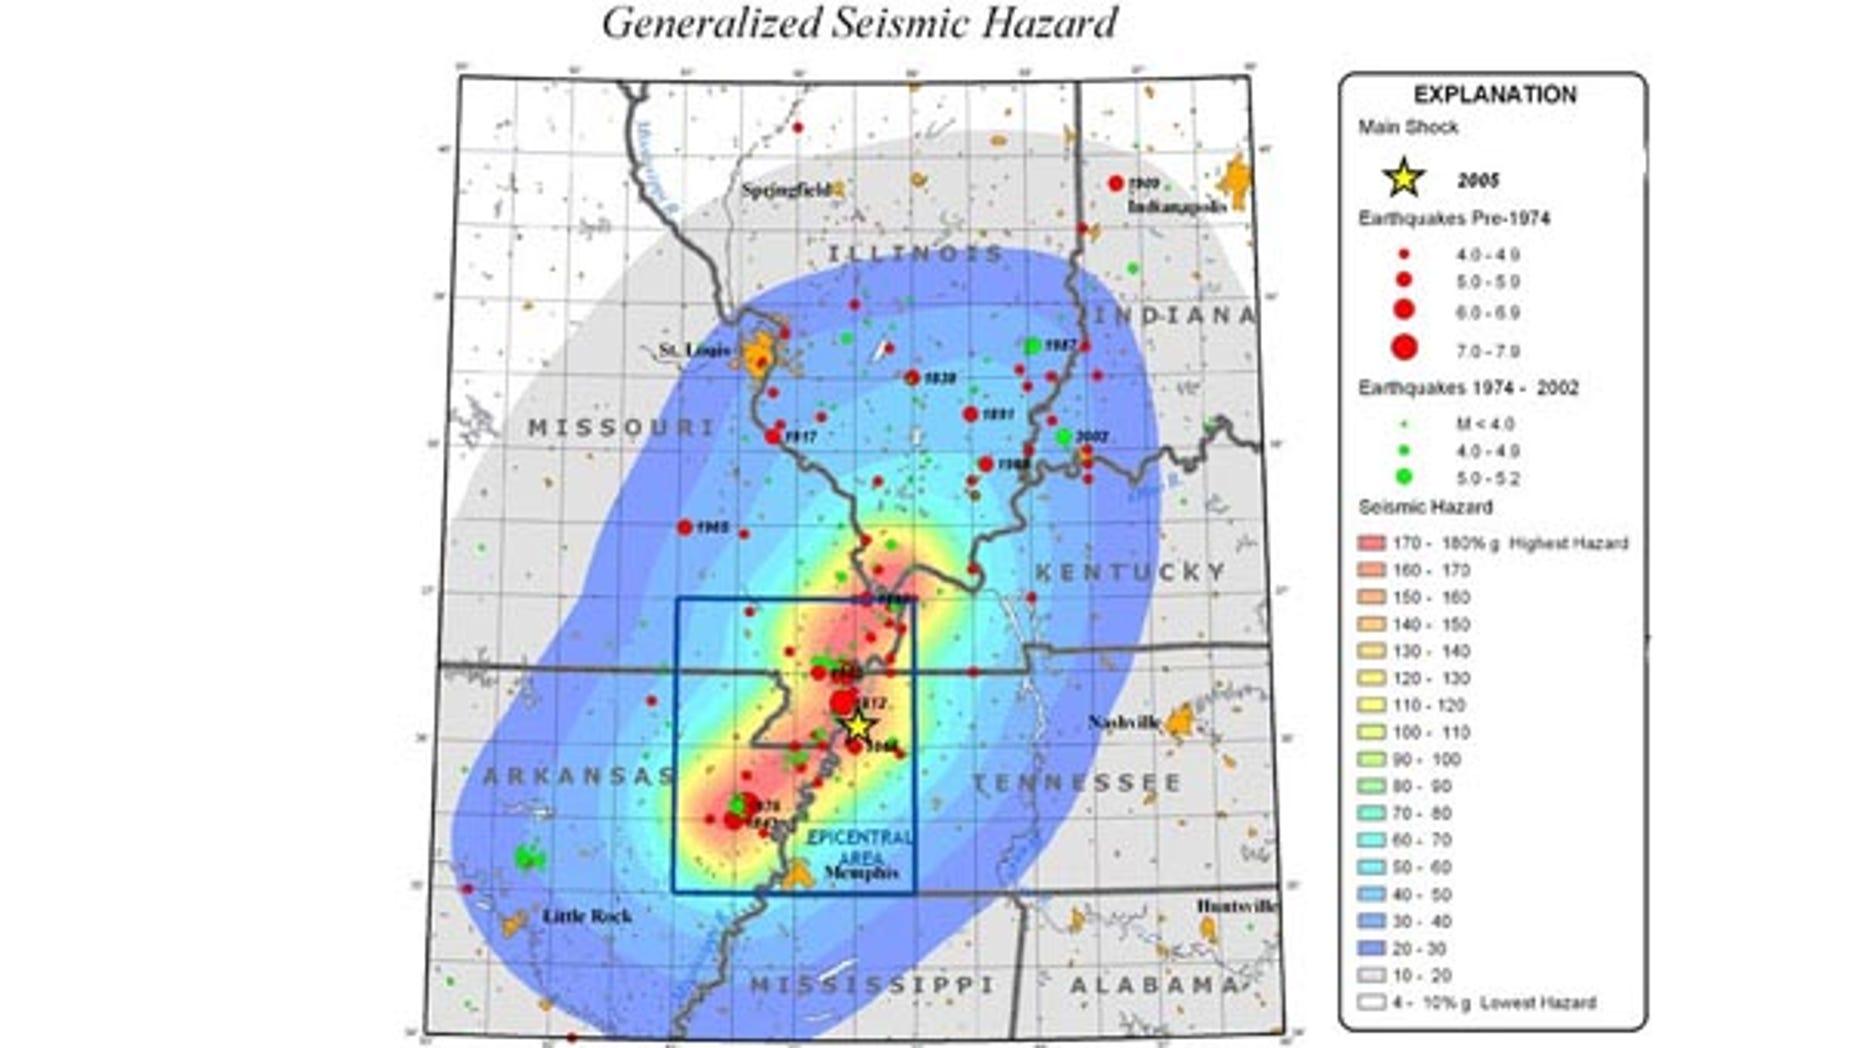 New Madrid Seismic Zone map